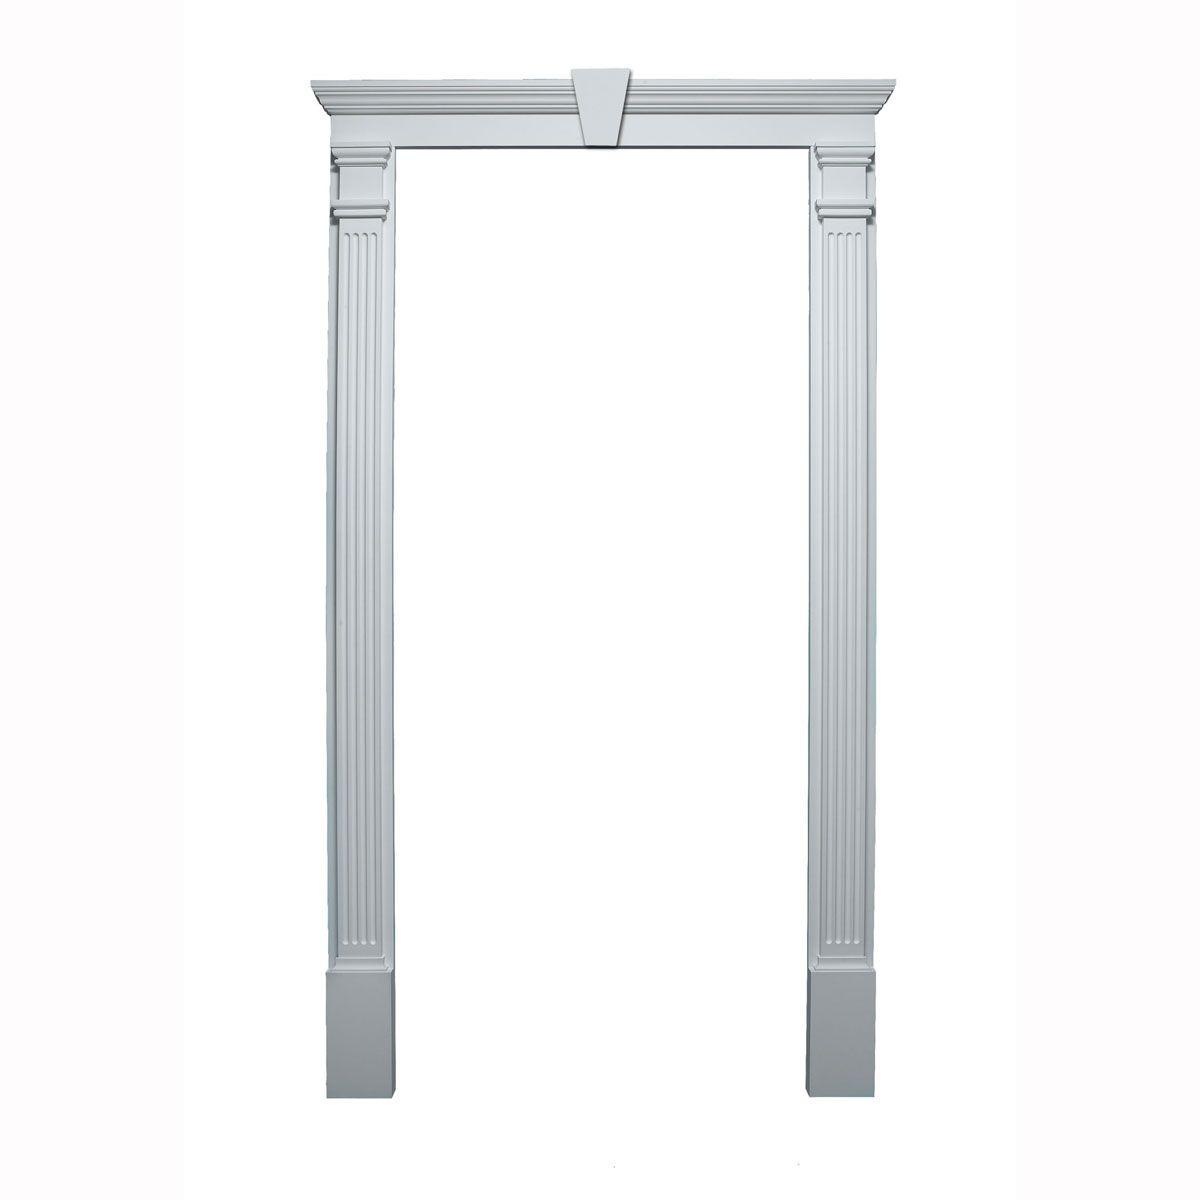 Door Trim Kit   Crosshead, Pilaster U0026 Keystone Included (For Door Sizes  36 Inch W   40 Inch W X 80 Inch H   90 Inch H)